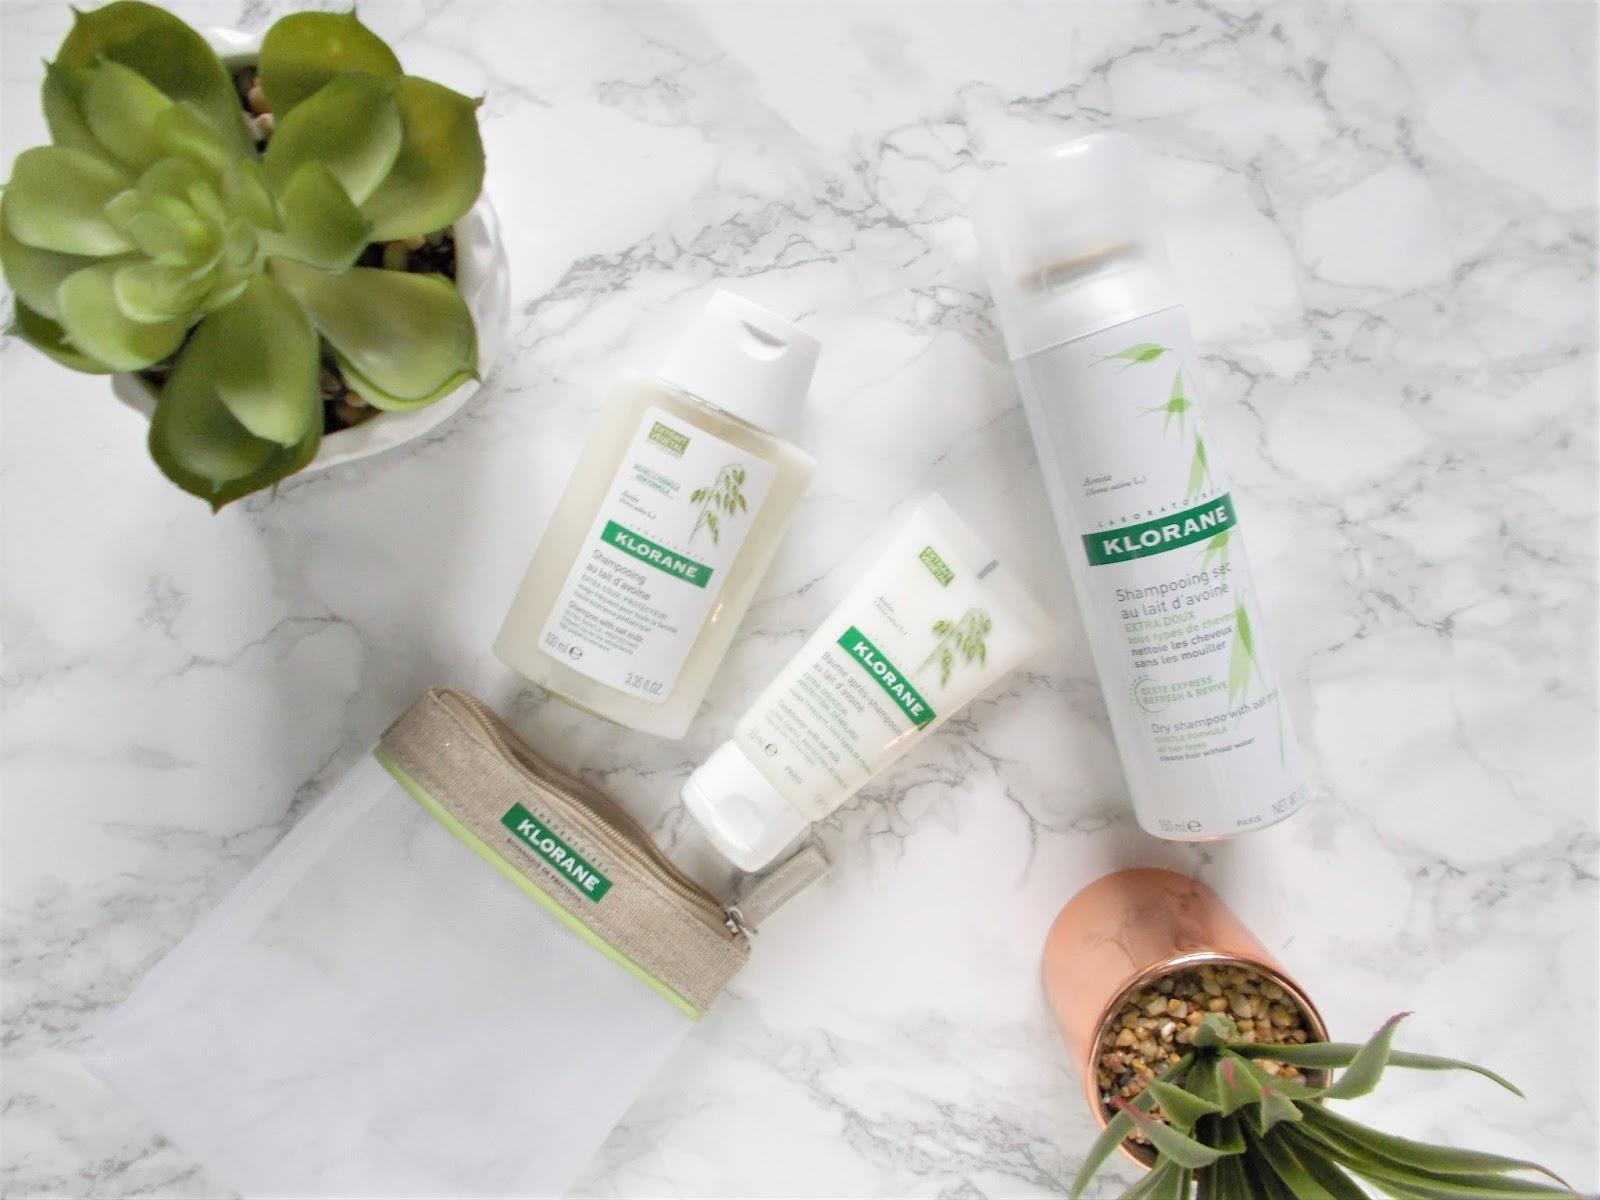 Klorane oat milk range shampoo conditioner dry shampoo review